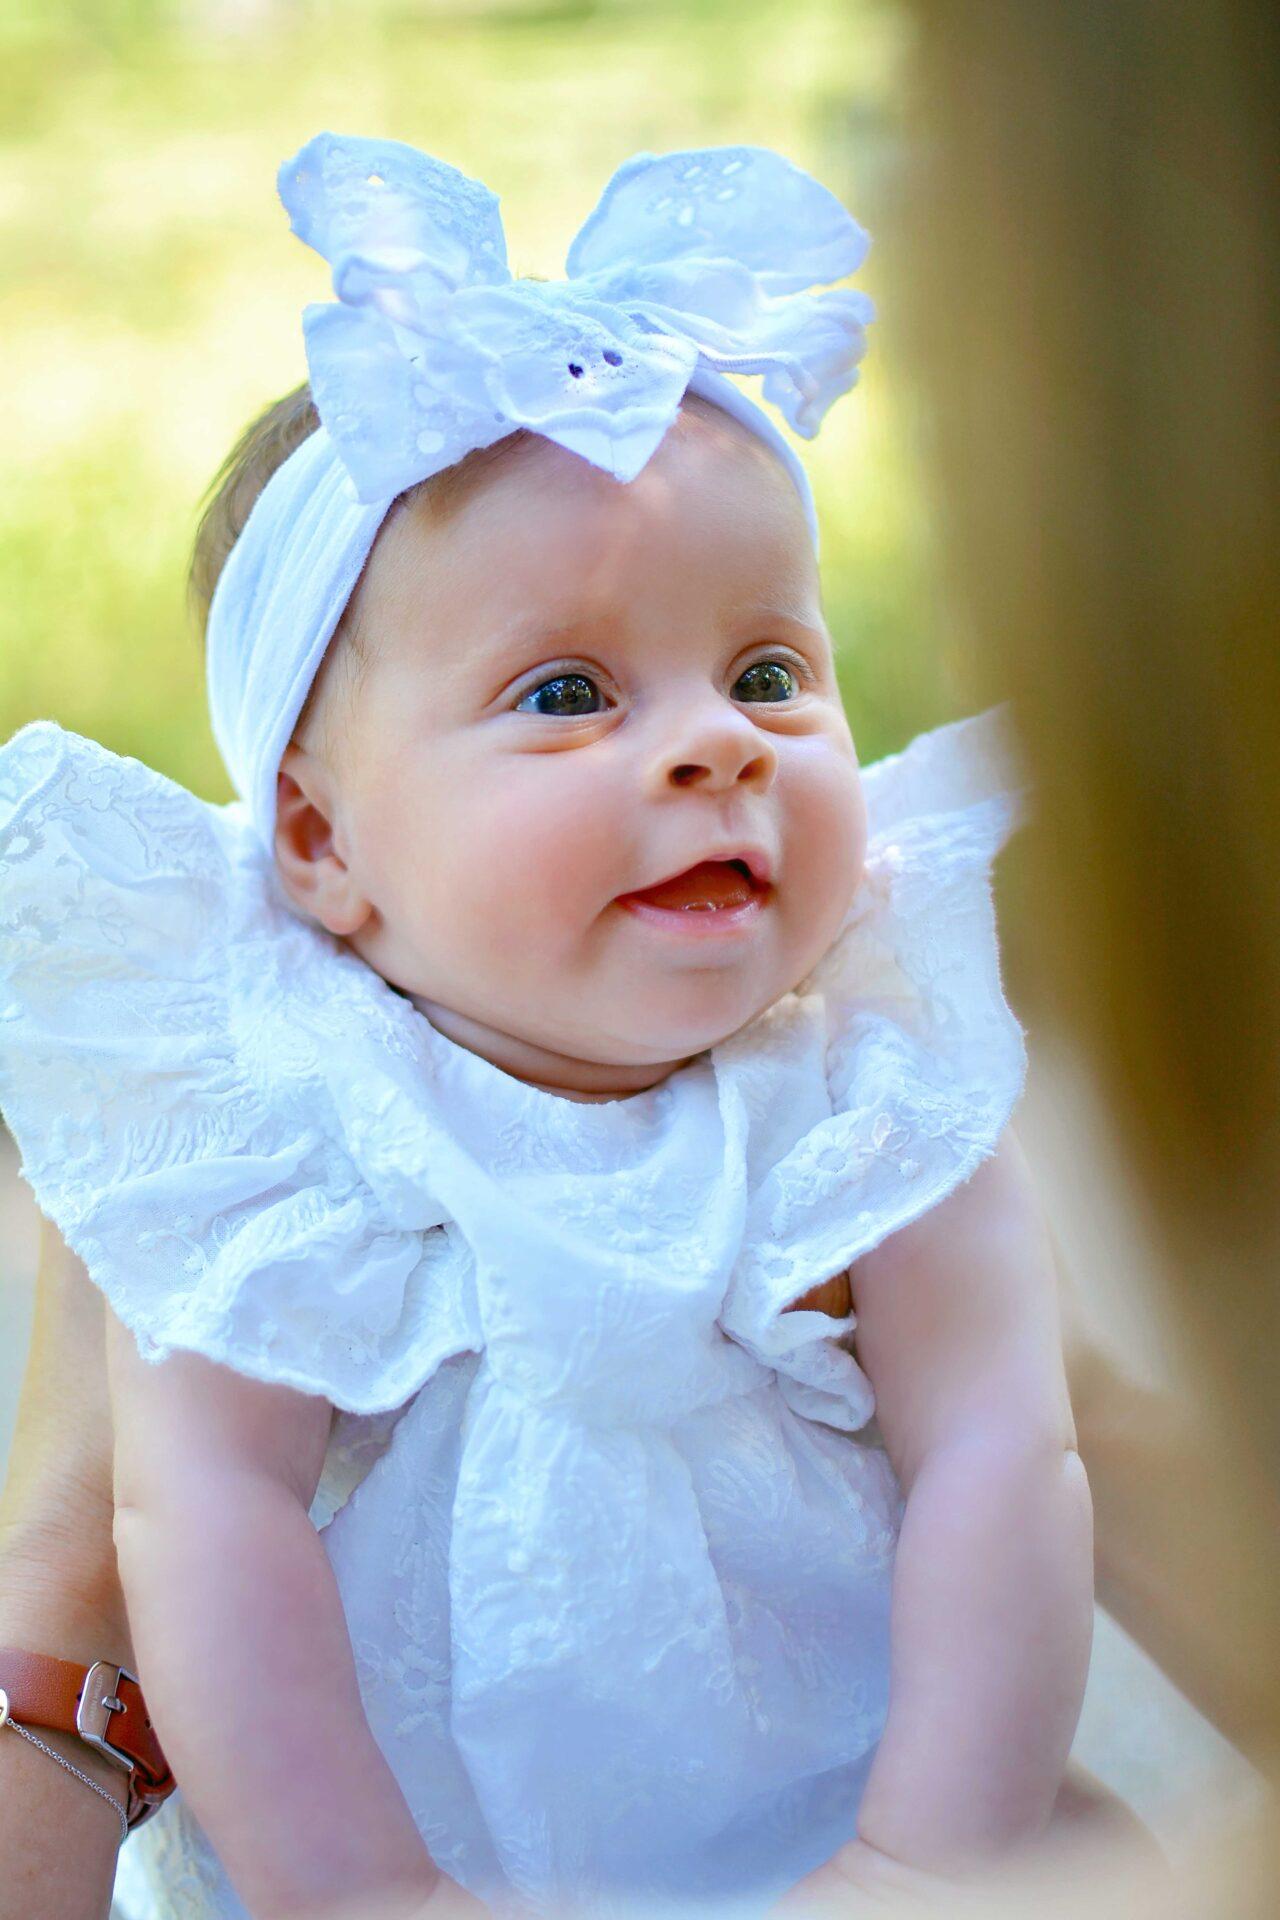 newborn-photography-at-regents-park-london